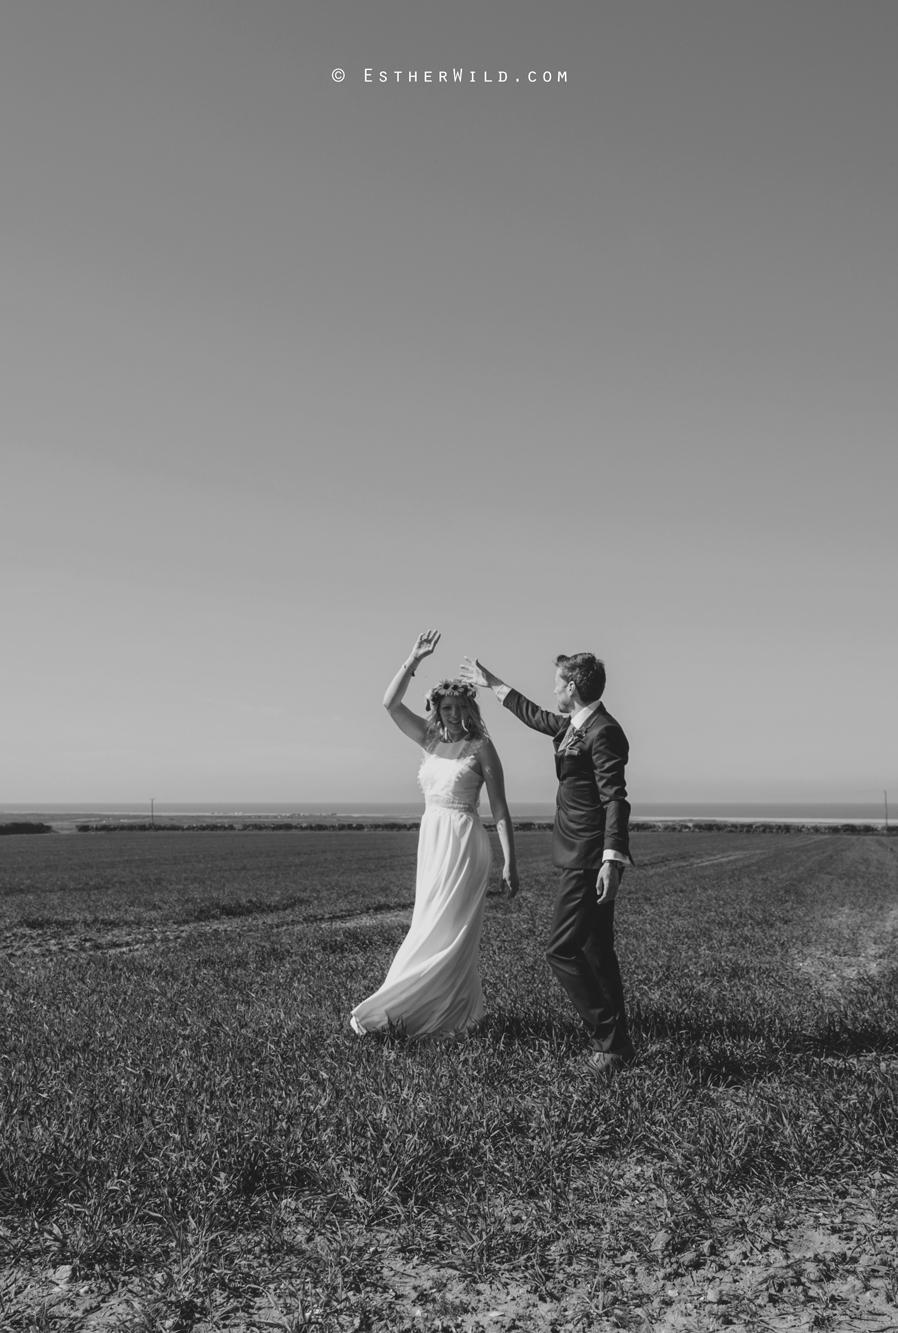 IMG_1482-1Cley_Barn_Drift_Norfolk_Coast_Wedding_Copyright_Esther_Wild_Photographer_.jpg